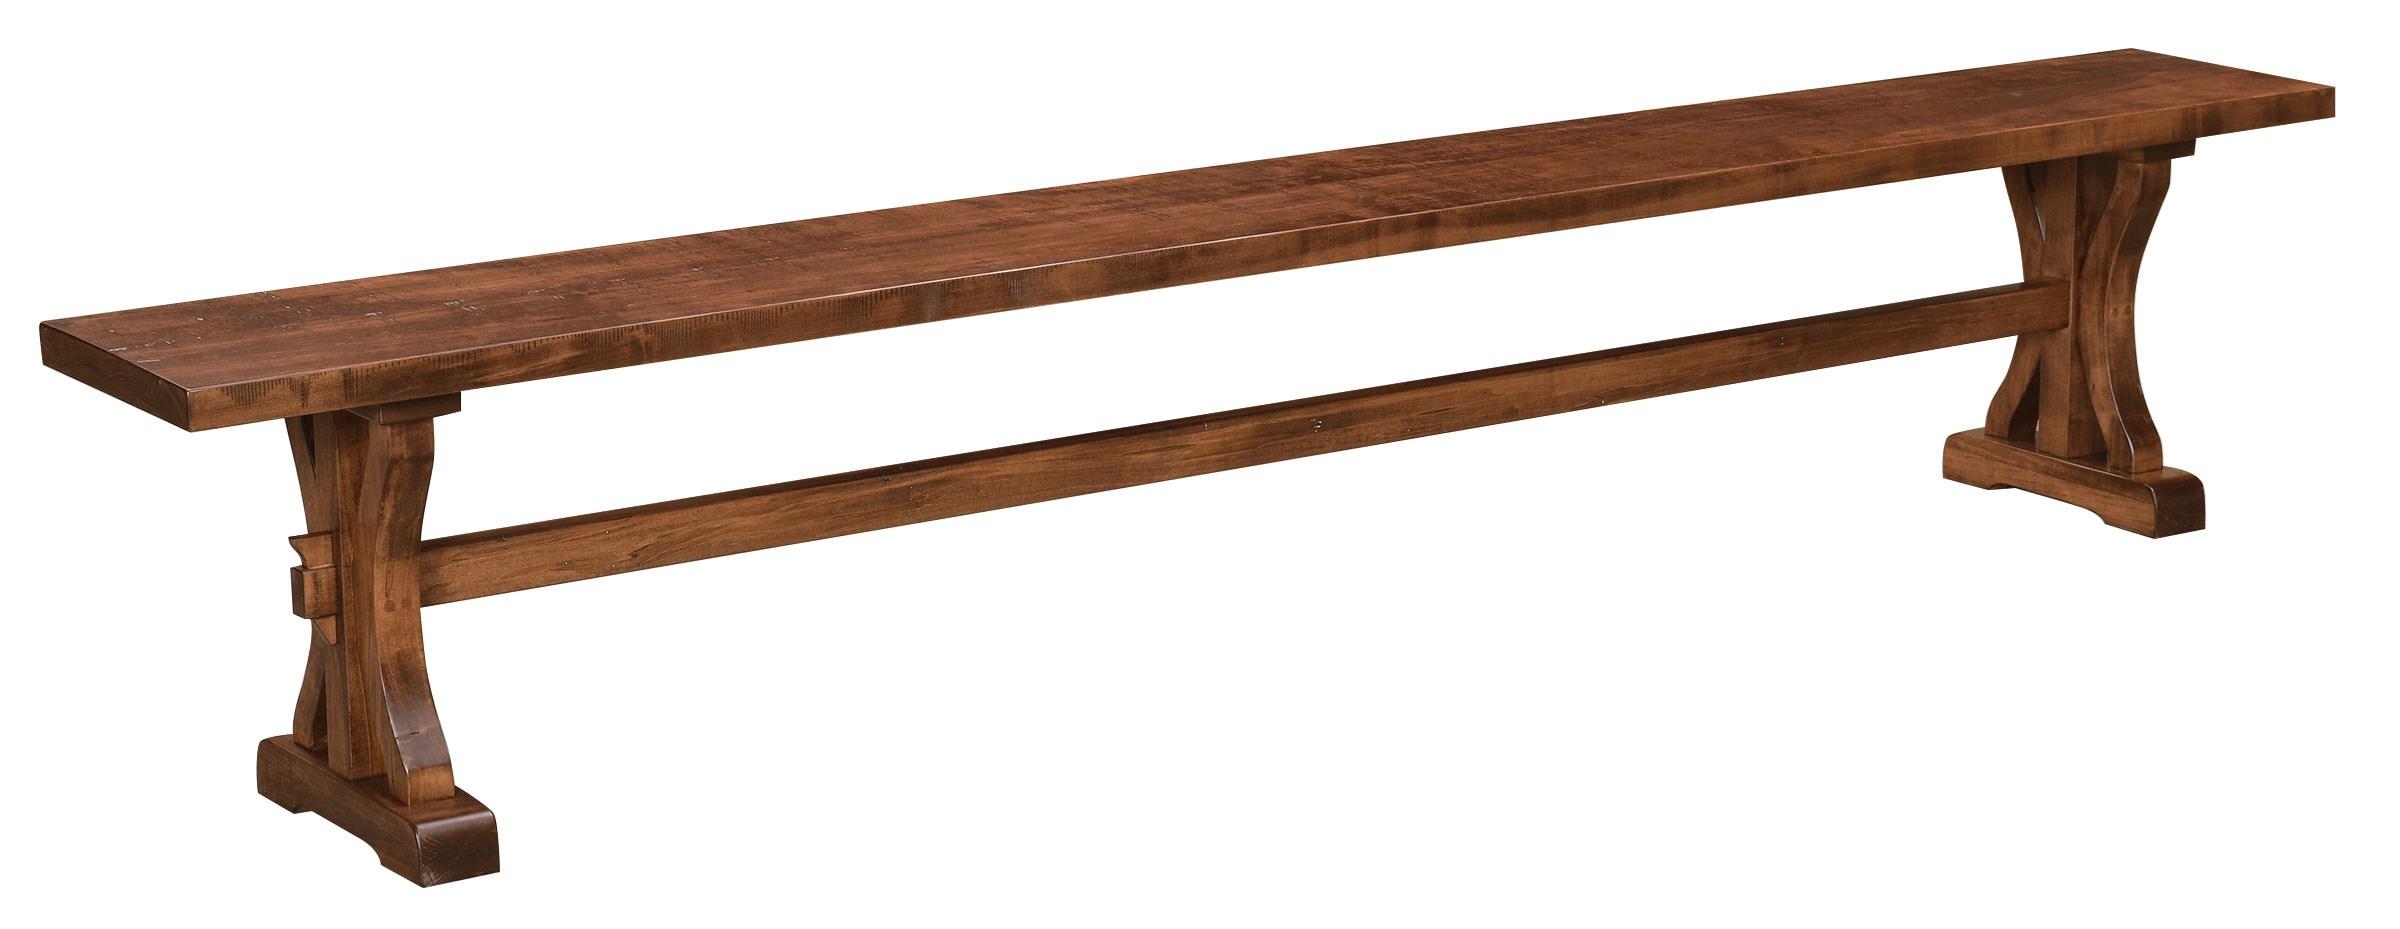 Karlisle Customizable Dining Bench by Weaver Woodcraft at Saugerties Furniture Mart